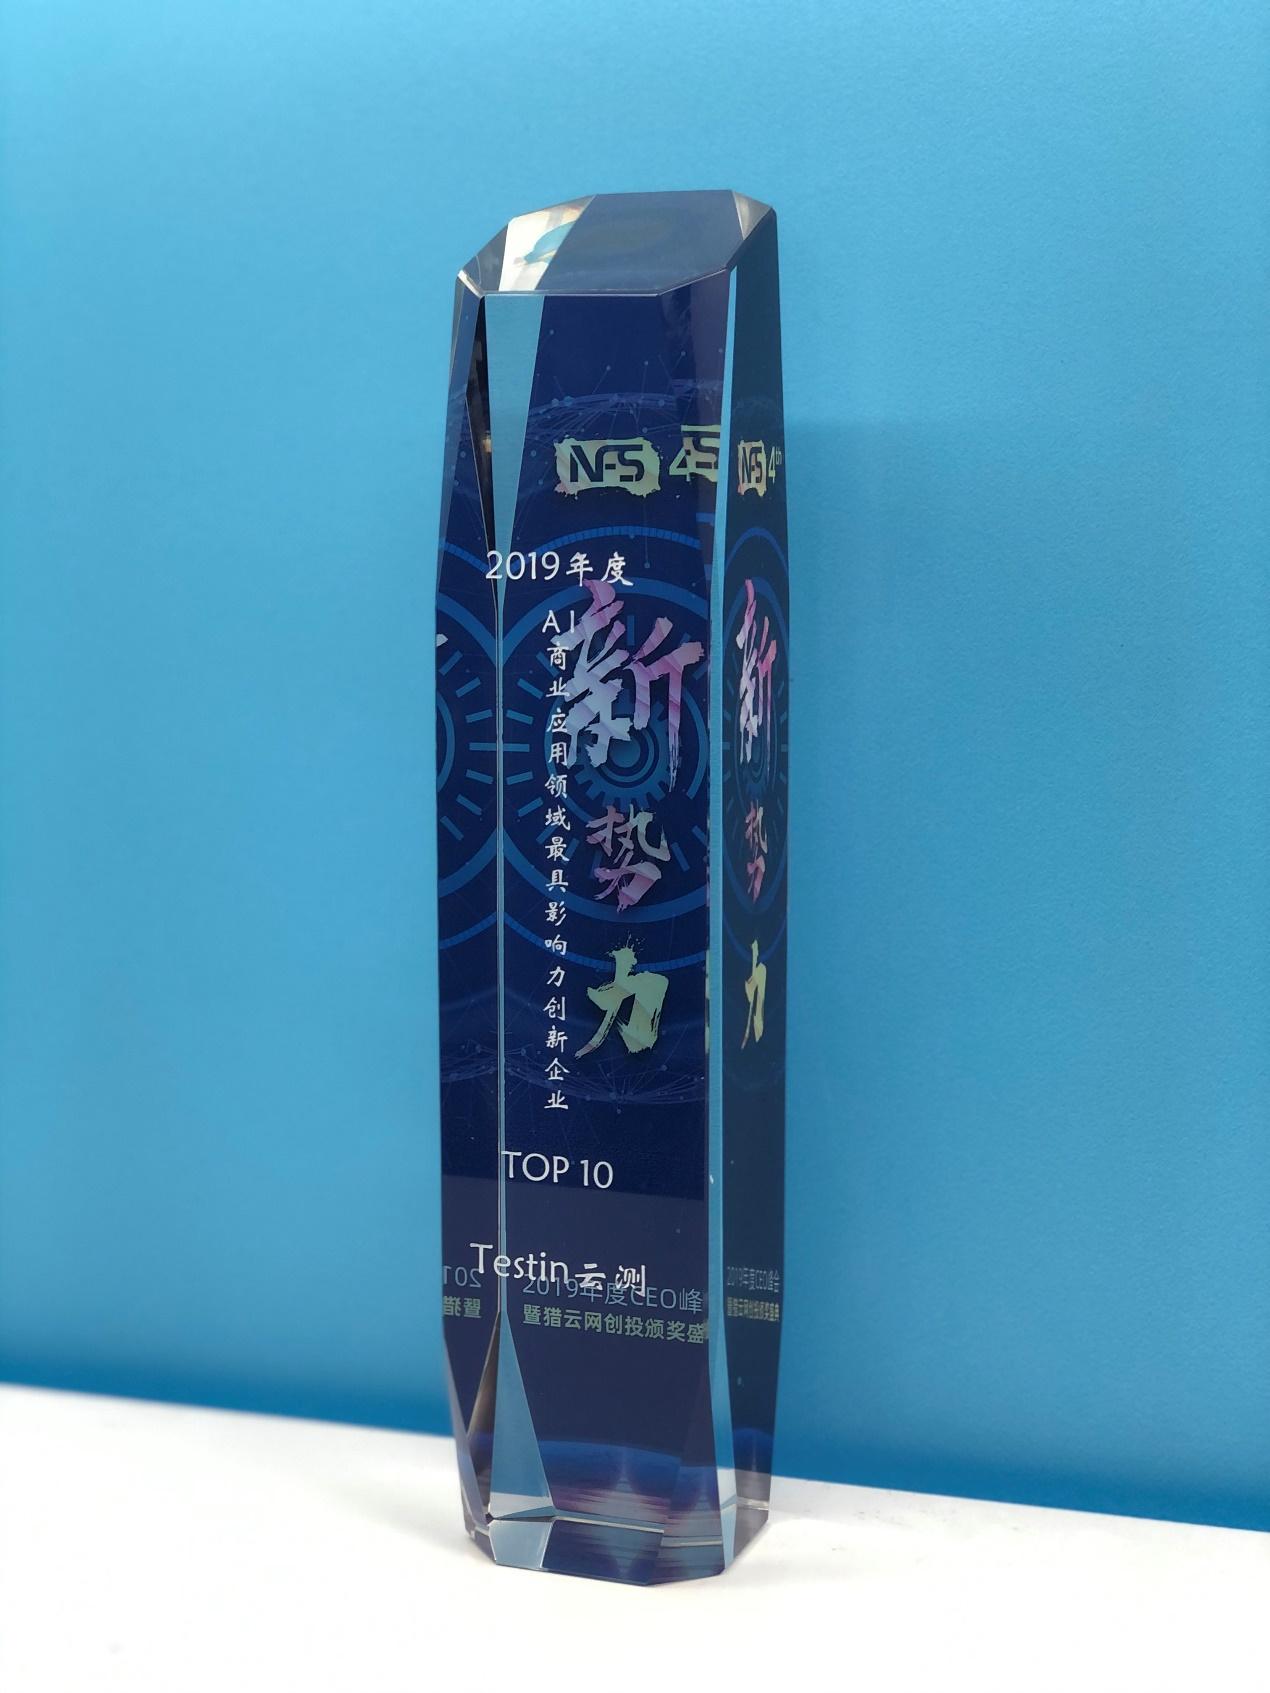 "Testin云测荣获""年度AI商业应用领域最具影响力创新企业TOP10""奖项"